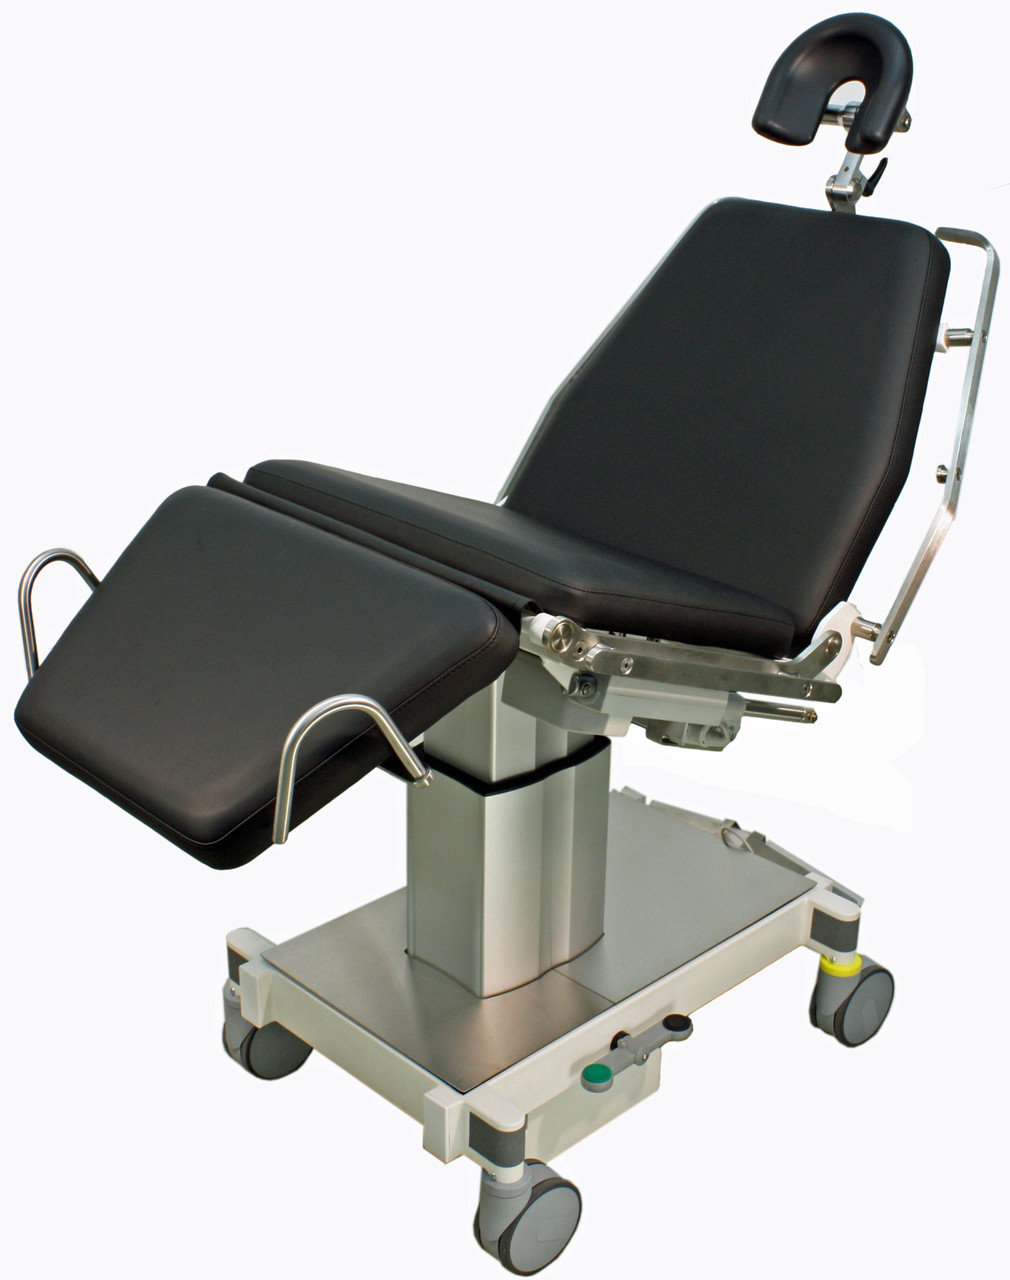 Операционное кресло Akrus SC 5010 HS